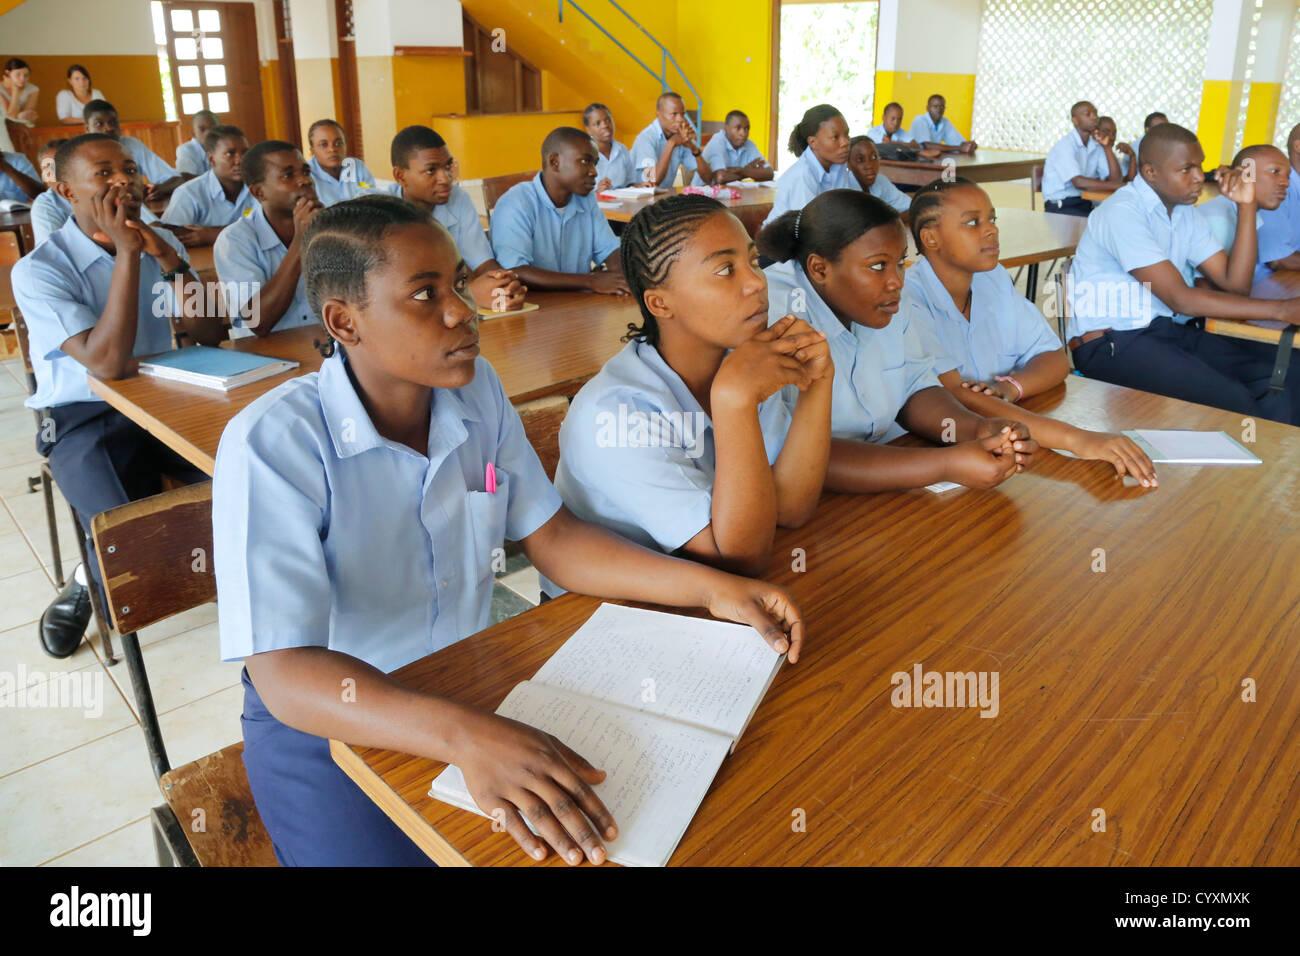 Students in a classroom of a vocational training center, Machui, Zanzibar, Tanzania - Stock Image